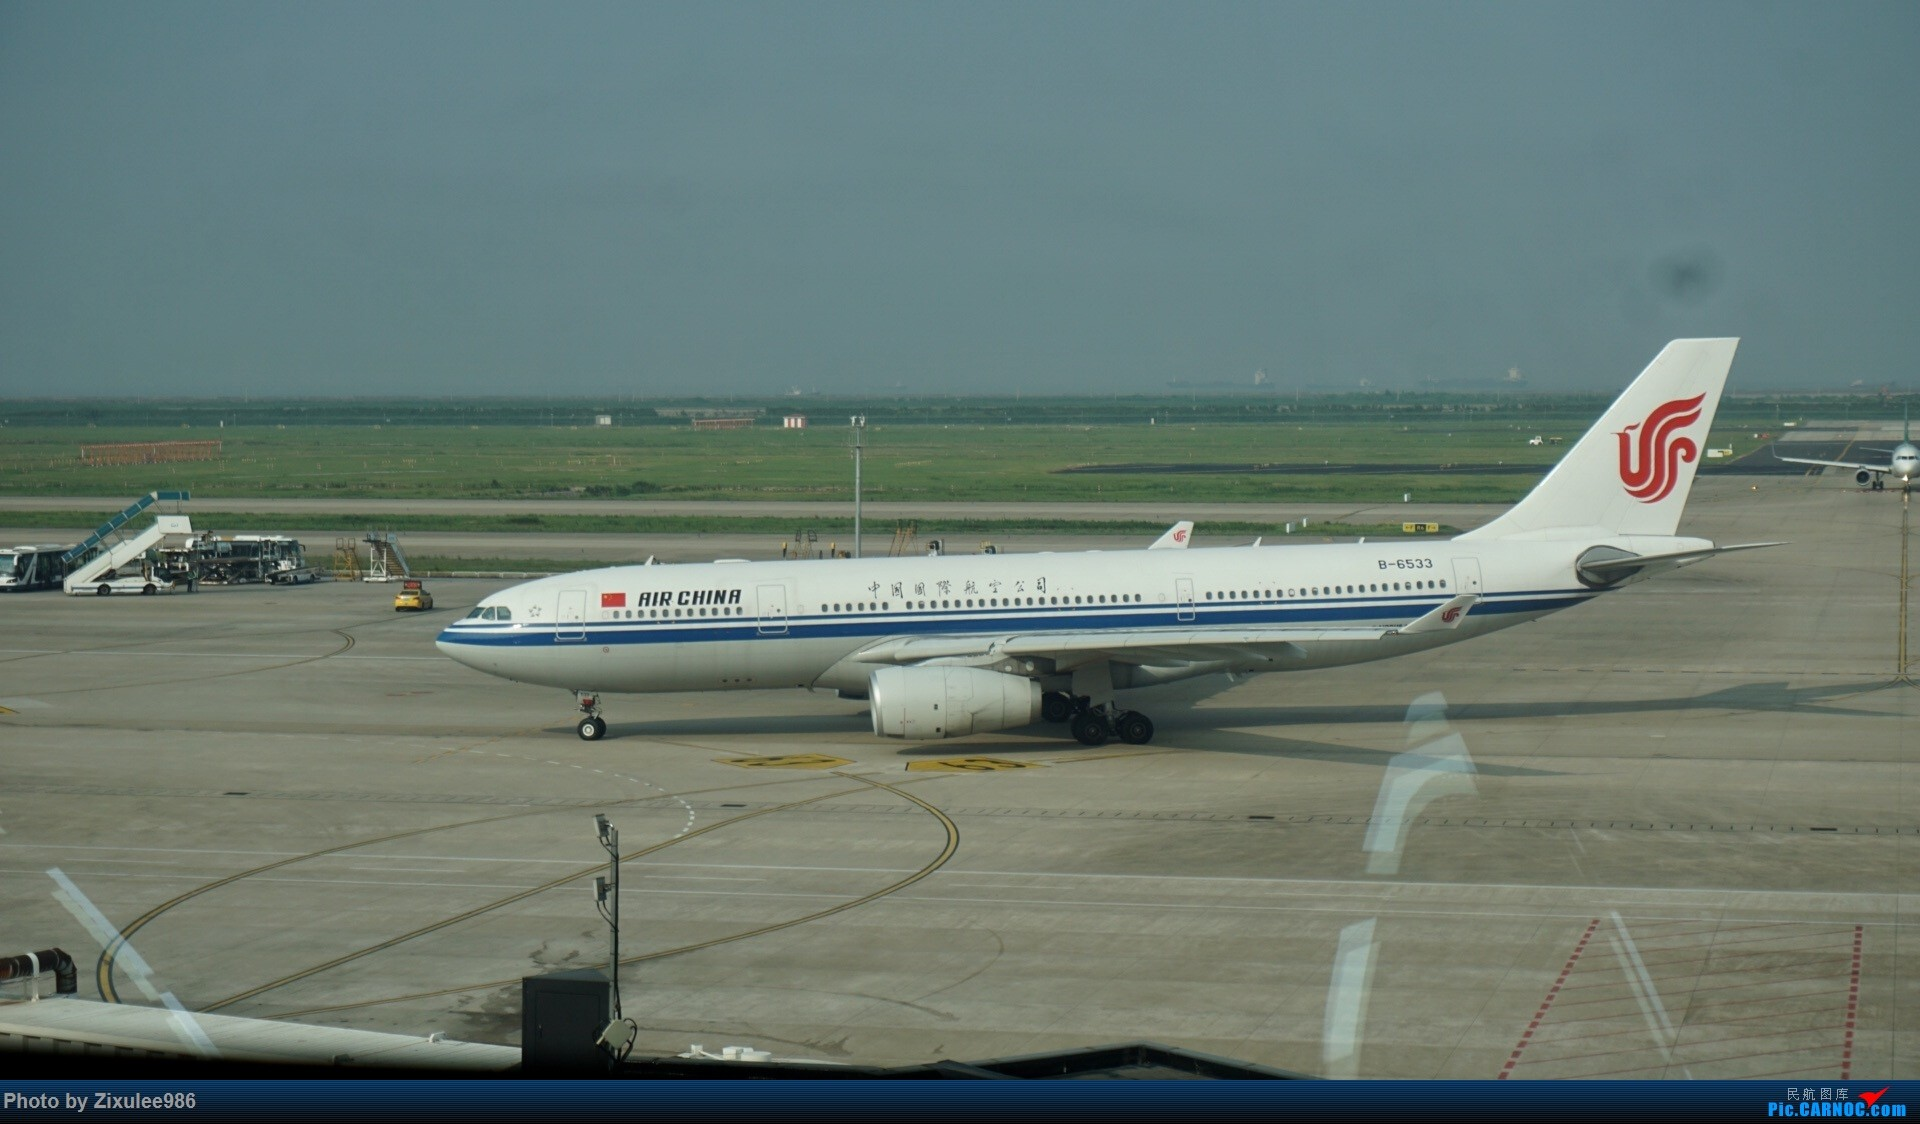 Re:[原创]加拿大21日游学之旅(一)~JJN-PVG-YYZ..(内含flightlog)~第一次发游记~多图缓更请谅解 AIRBUS A330-200 B-6533 中国上海浦东国际机场